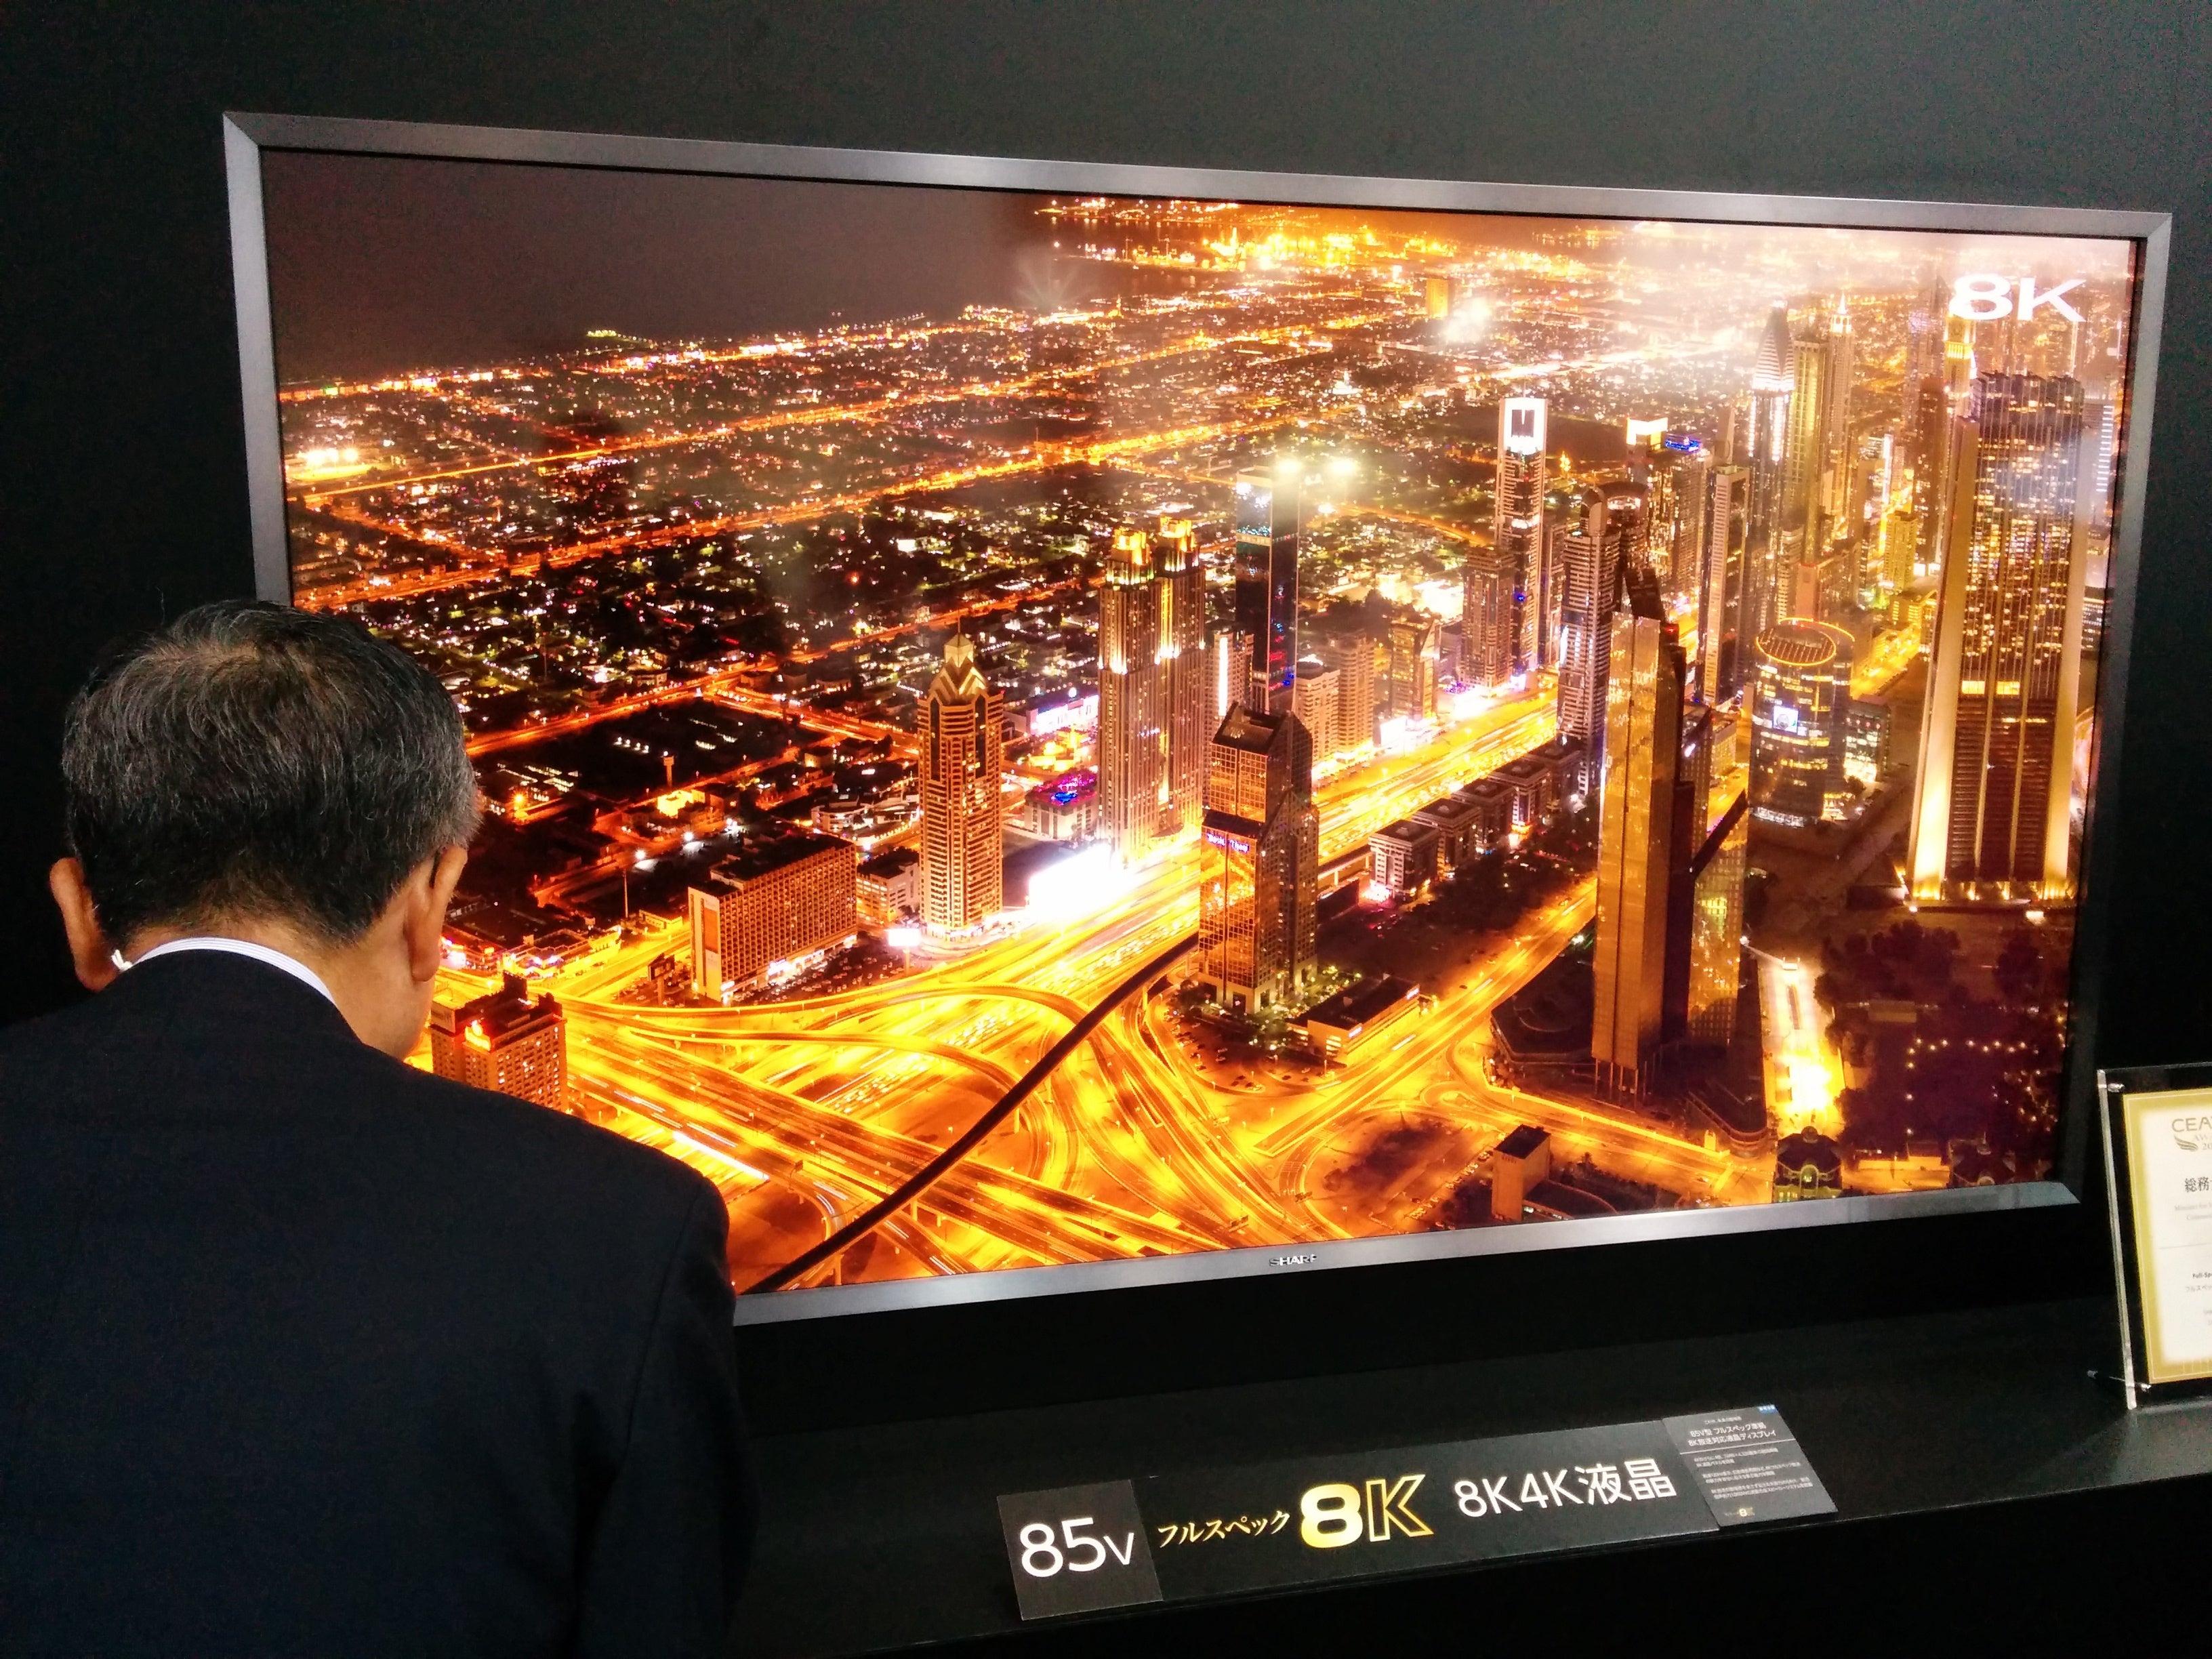 TV tech terms demystified, part one: Screen sizes